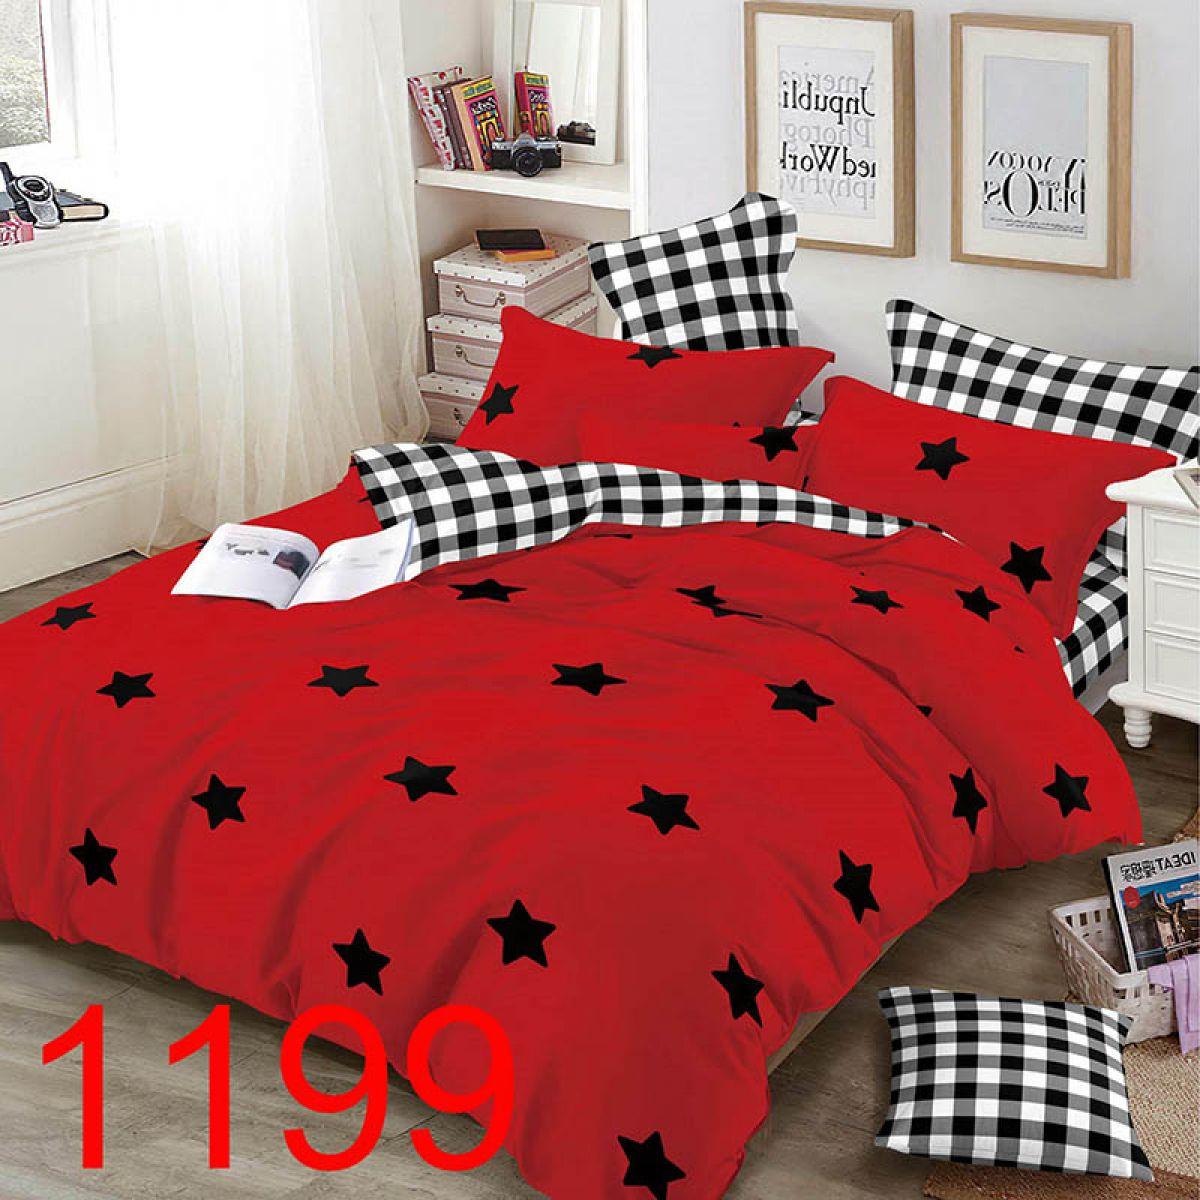 Double-sided Beddings - FBC-8060 - 140x200 cm - 2 pcs